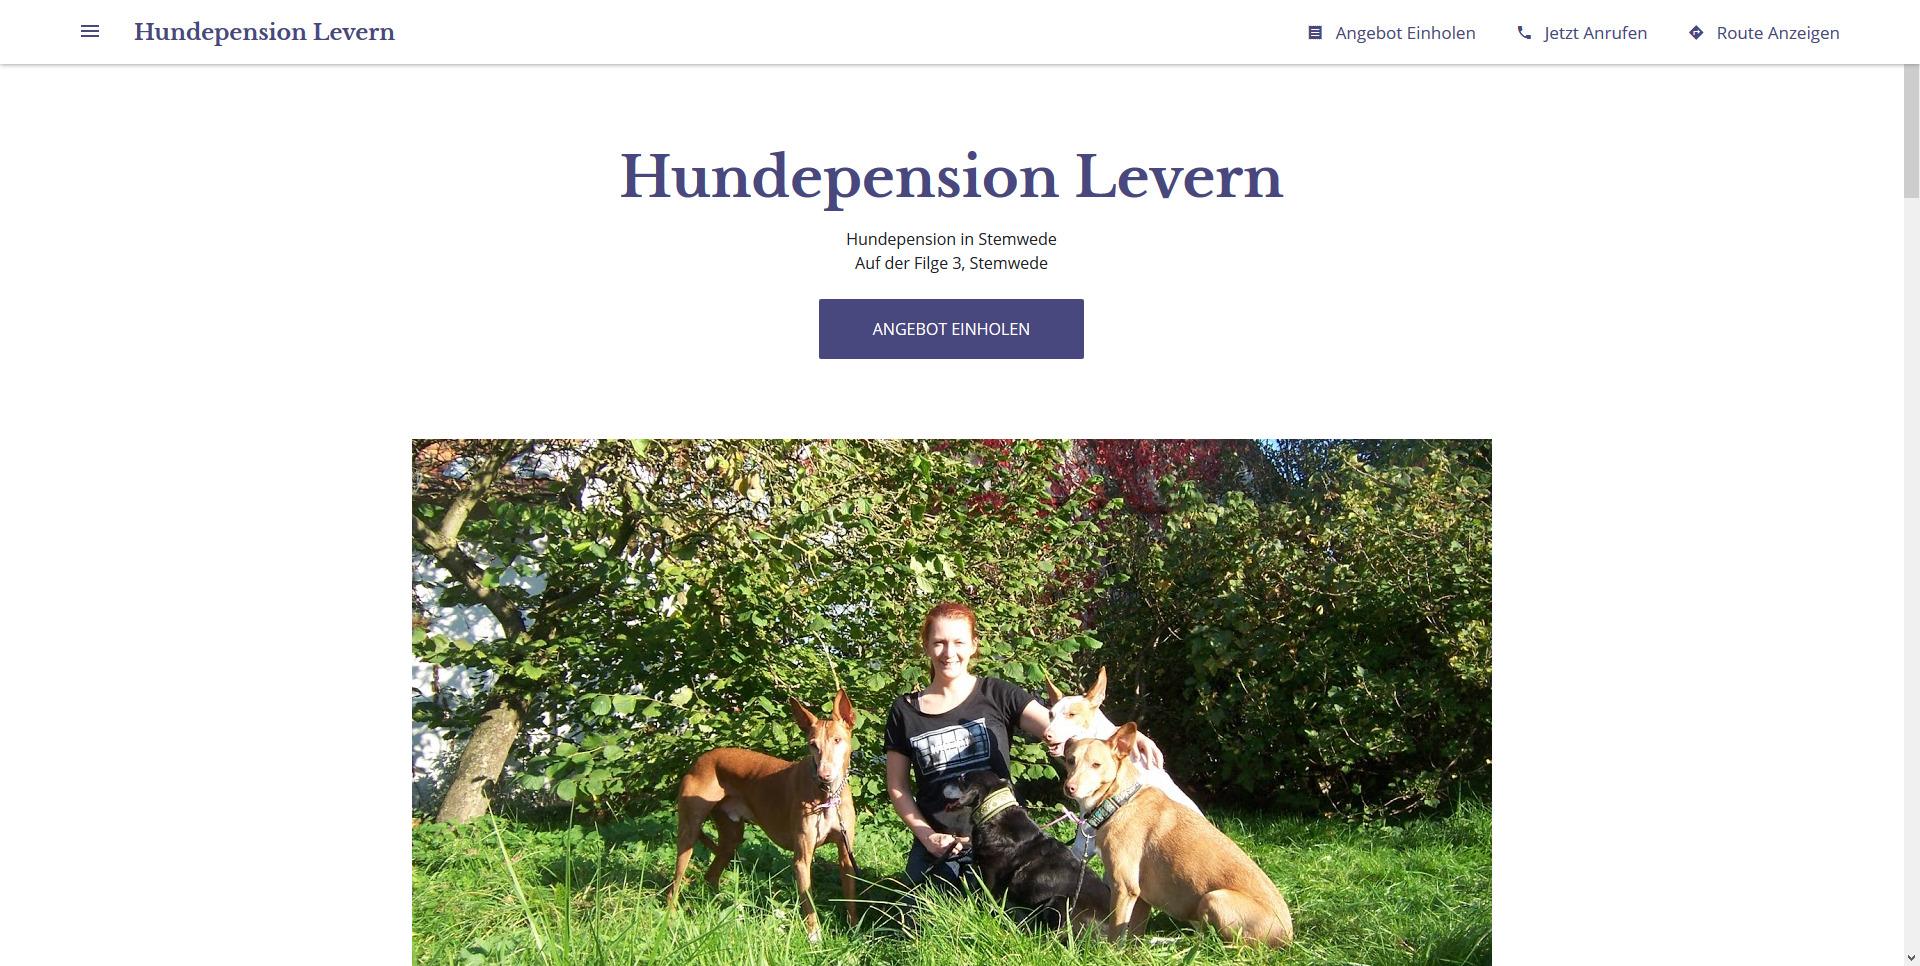 Hundepension Levern